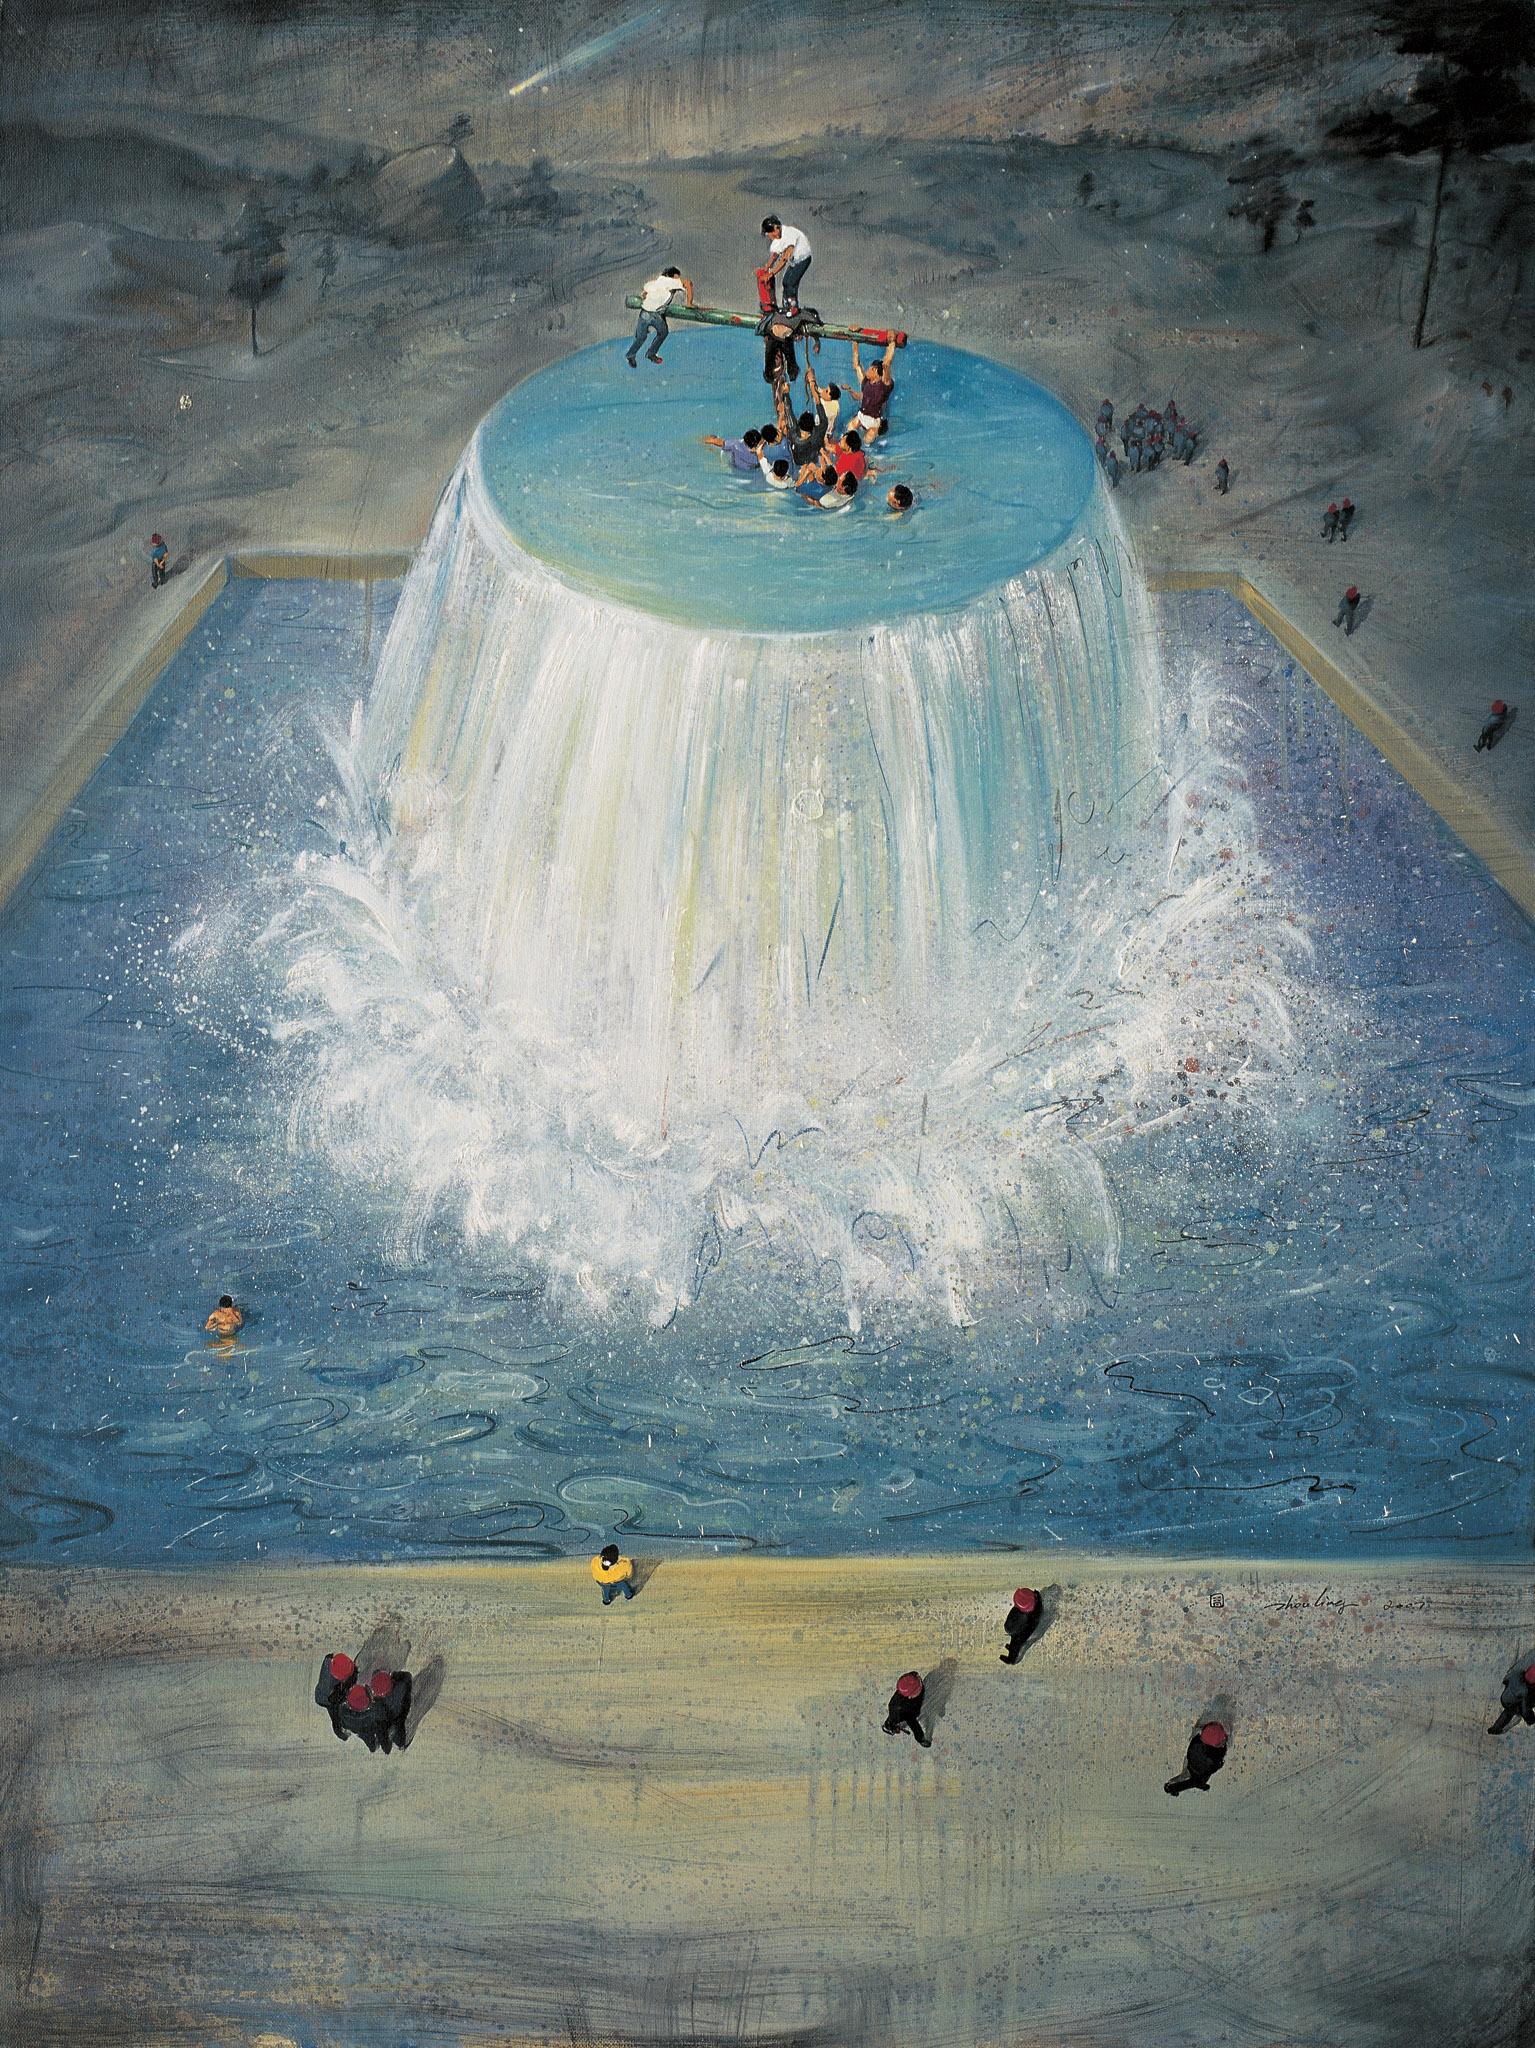 Zhou Jinhua 周金华, Fountain  No.1 源泉 No.1, 2007, Oil on canvas 布面油画, 145 x 110 cm